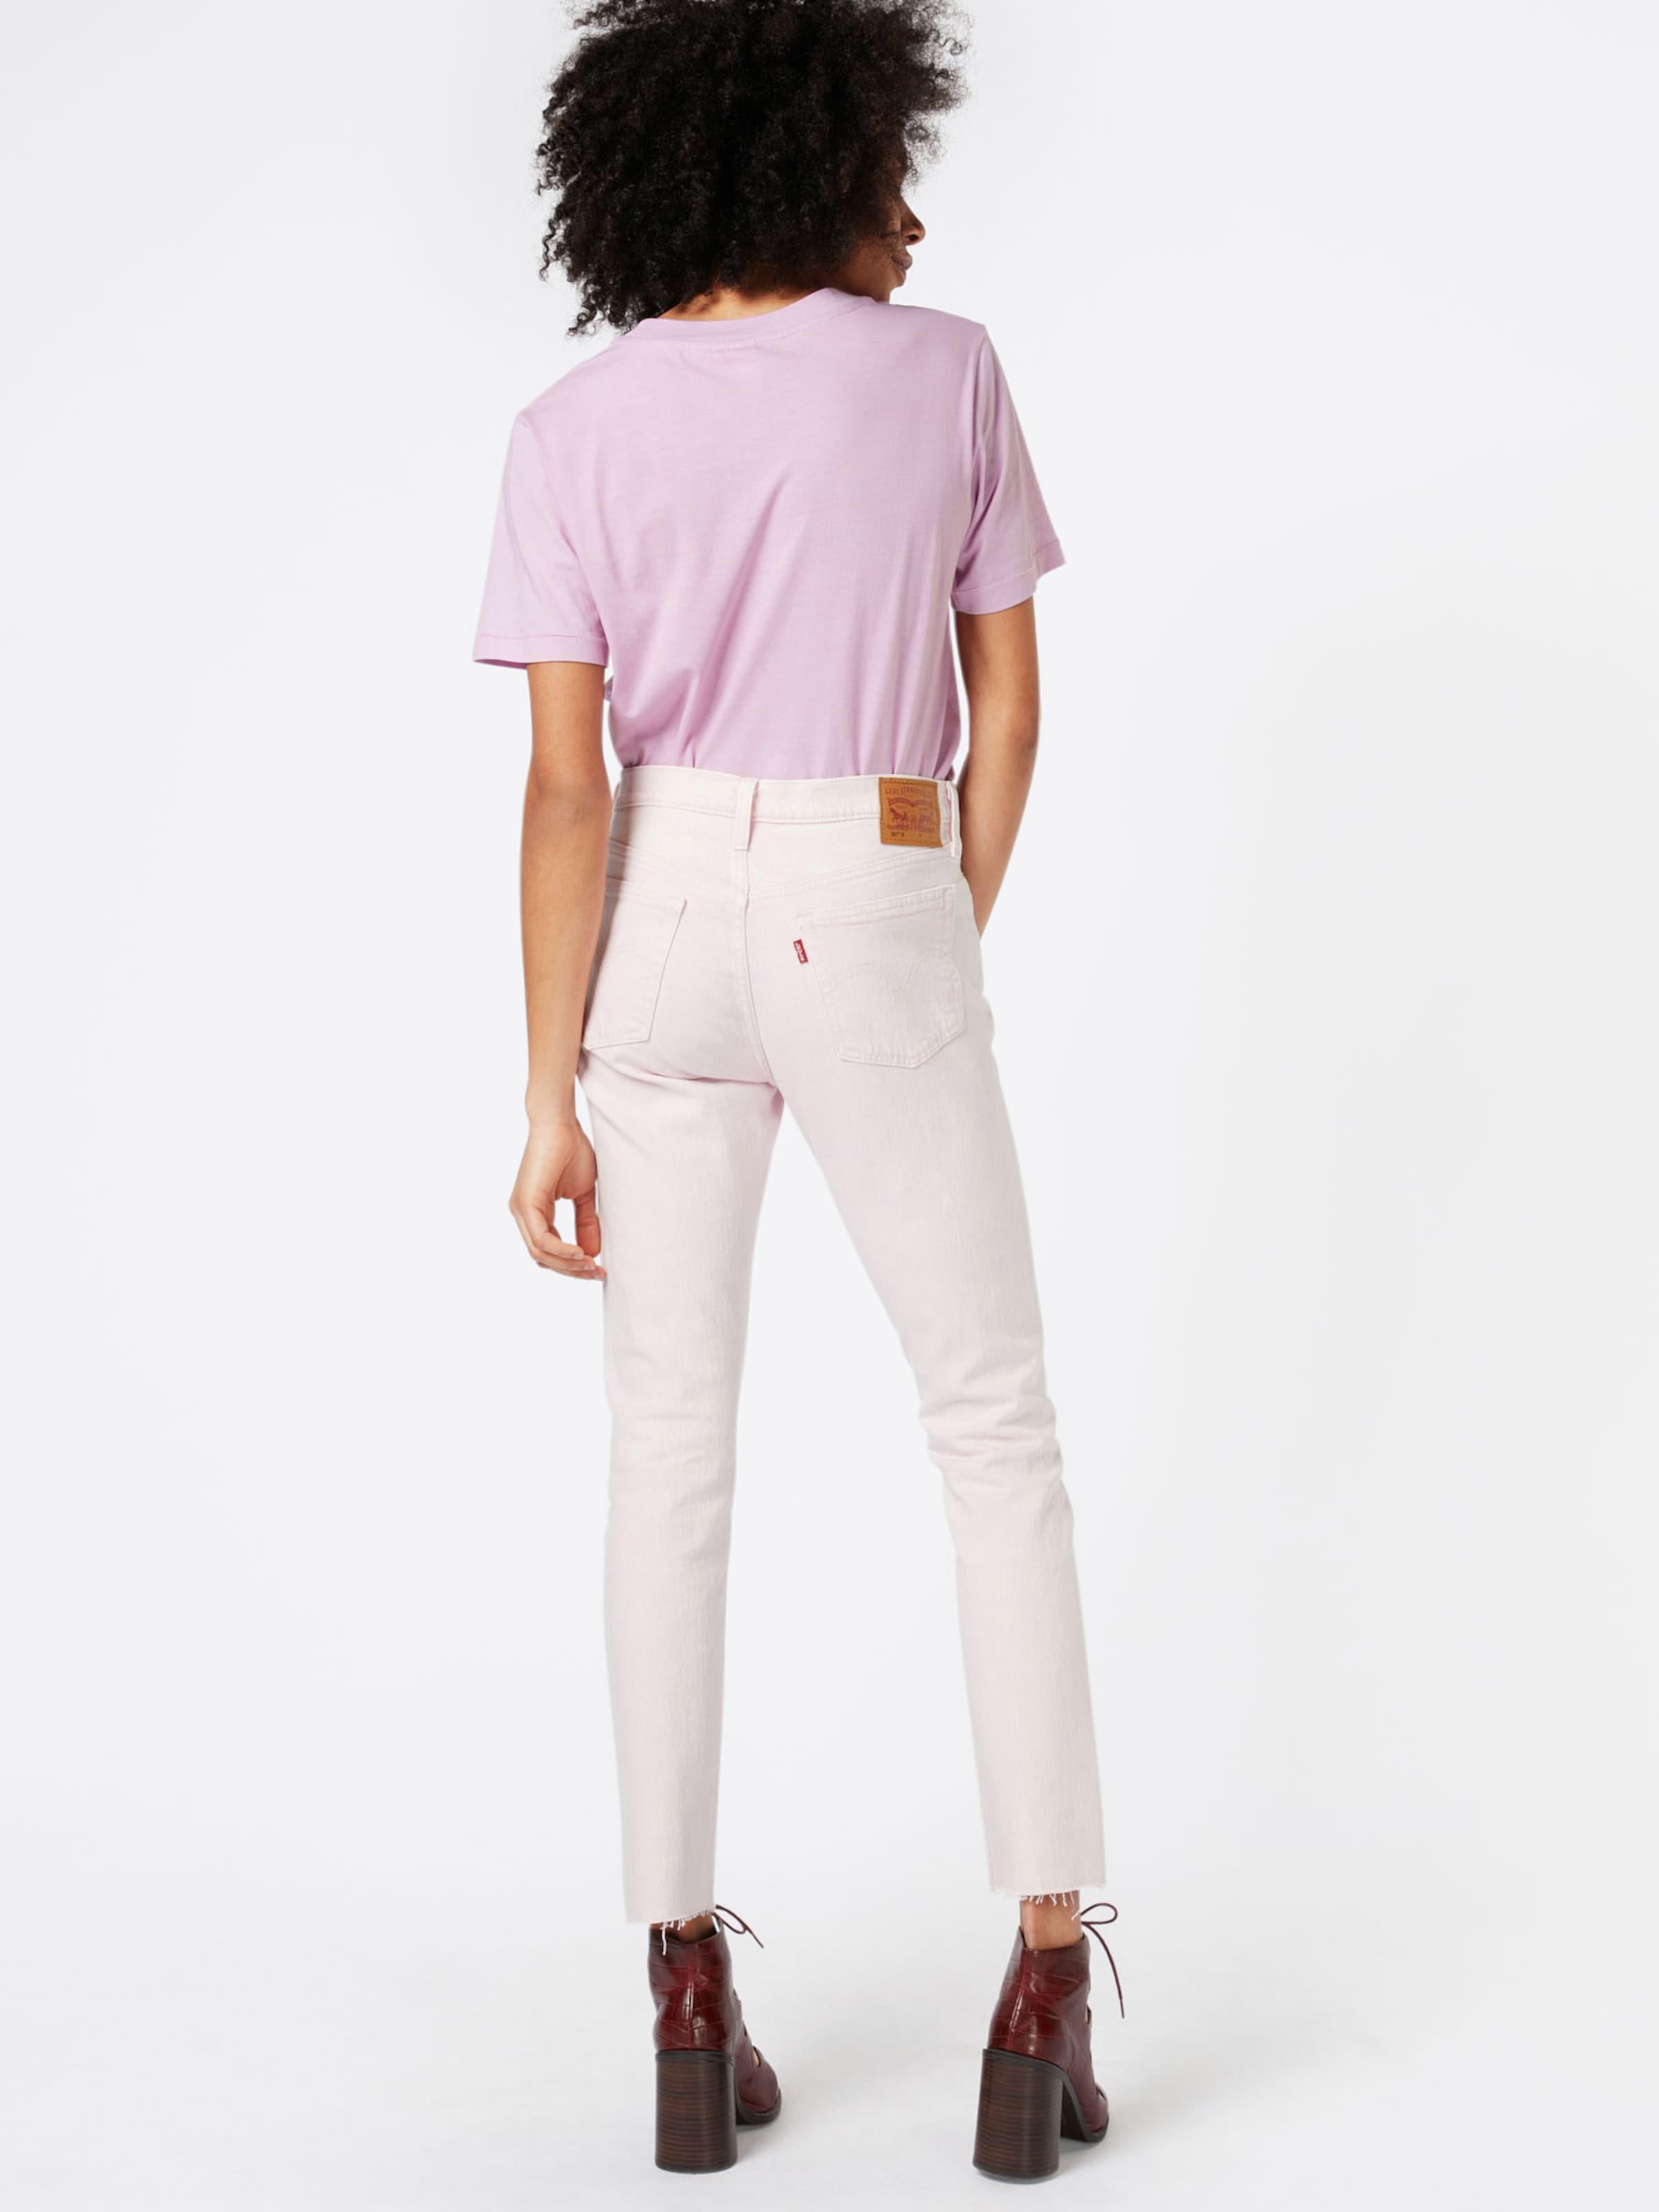 Rosa Jeans In Levi's '501' Skinny 34jLAc5RqS